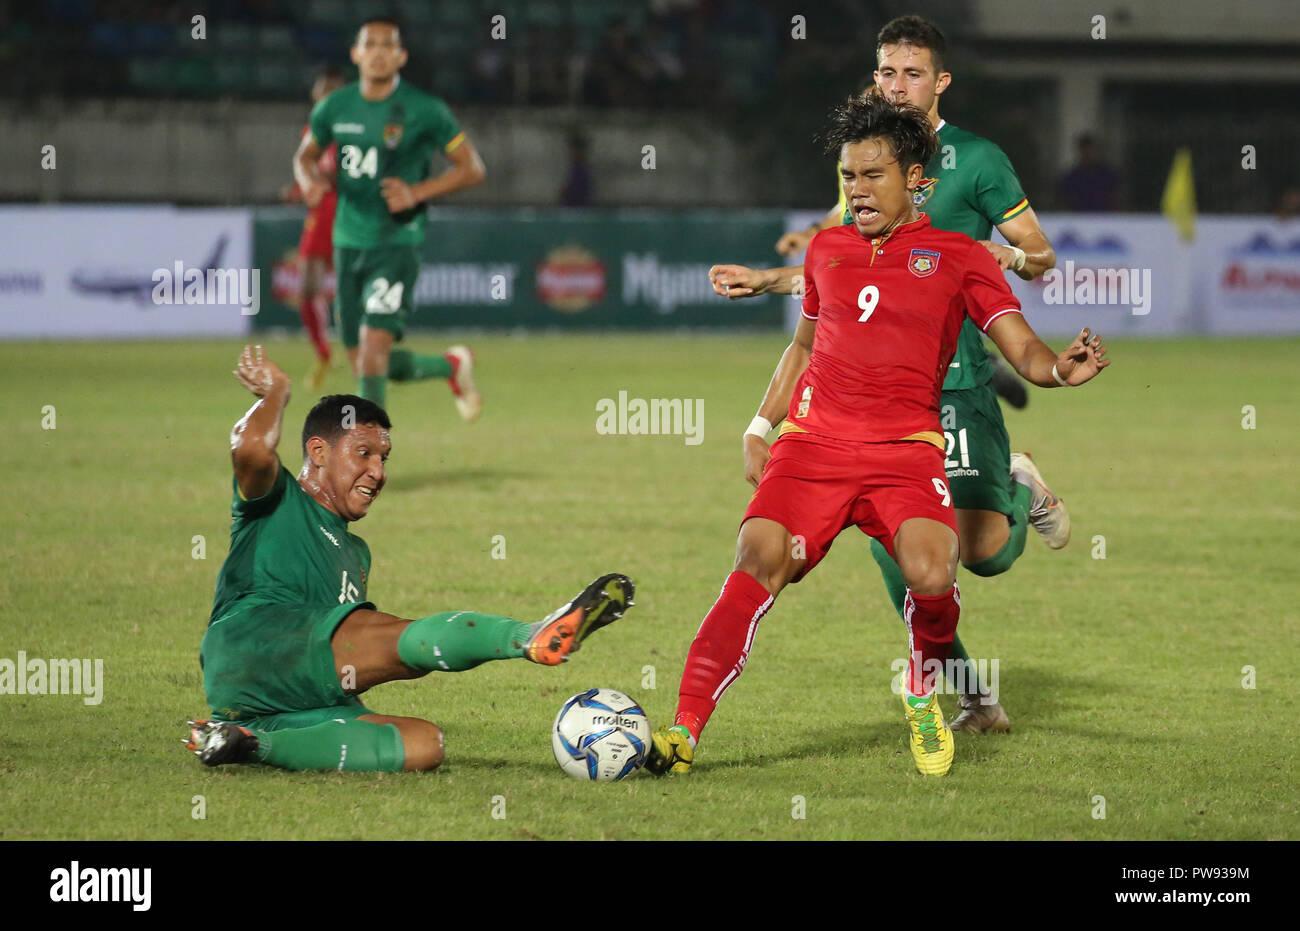 Min 3 Stock Photos Images Alamy Asian Games 2018 Ball Bhin 13cm 13th Oct Zin Tun R Of